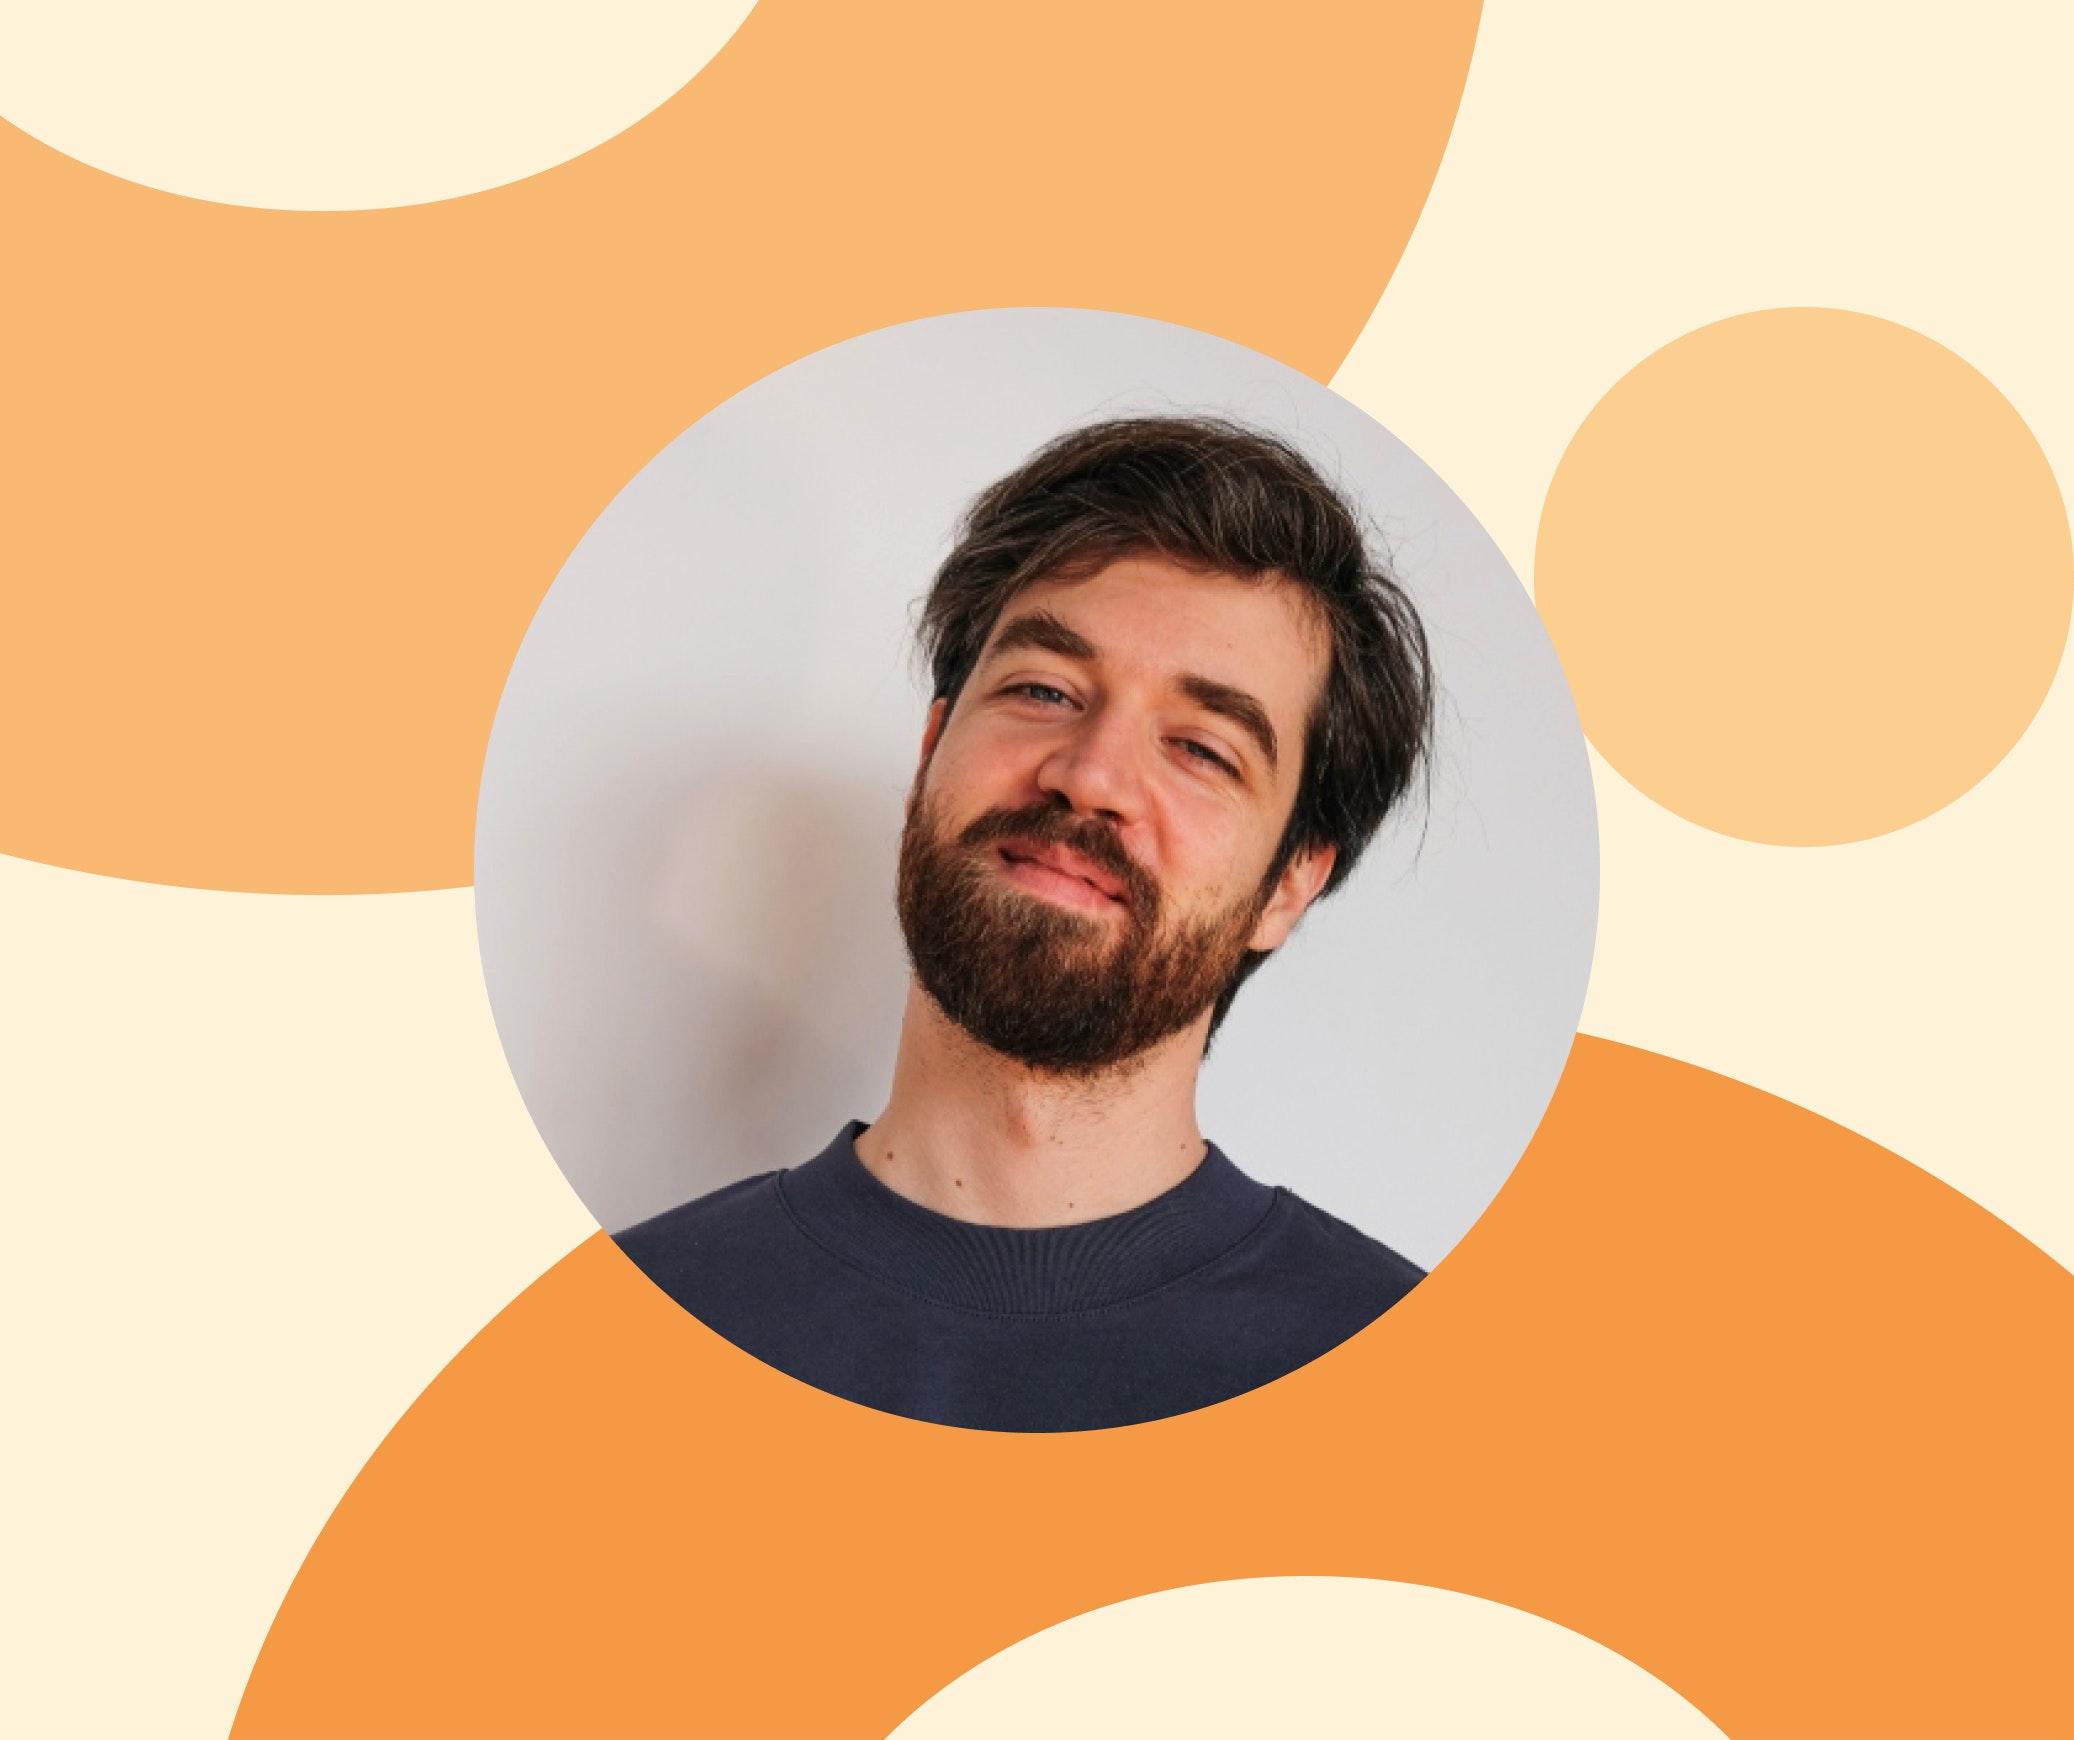 Gabriel Kirmaier's 10 bites of UX wisdom every designer should know